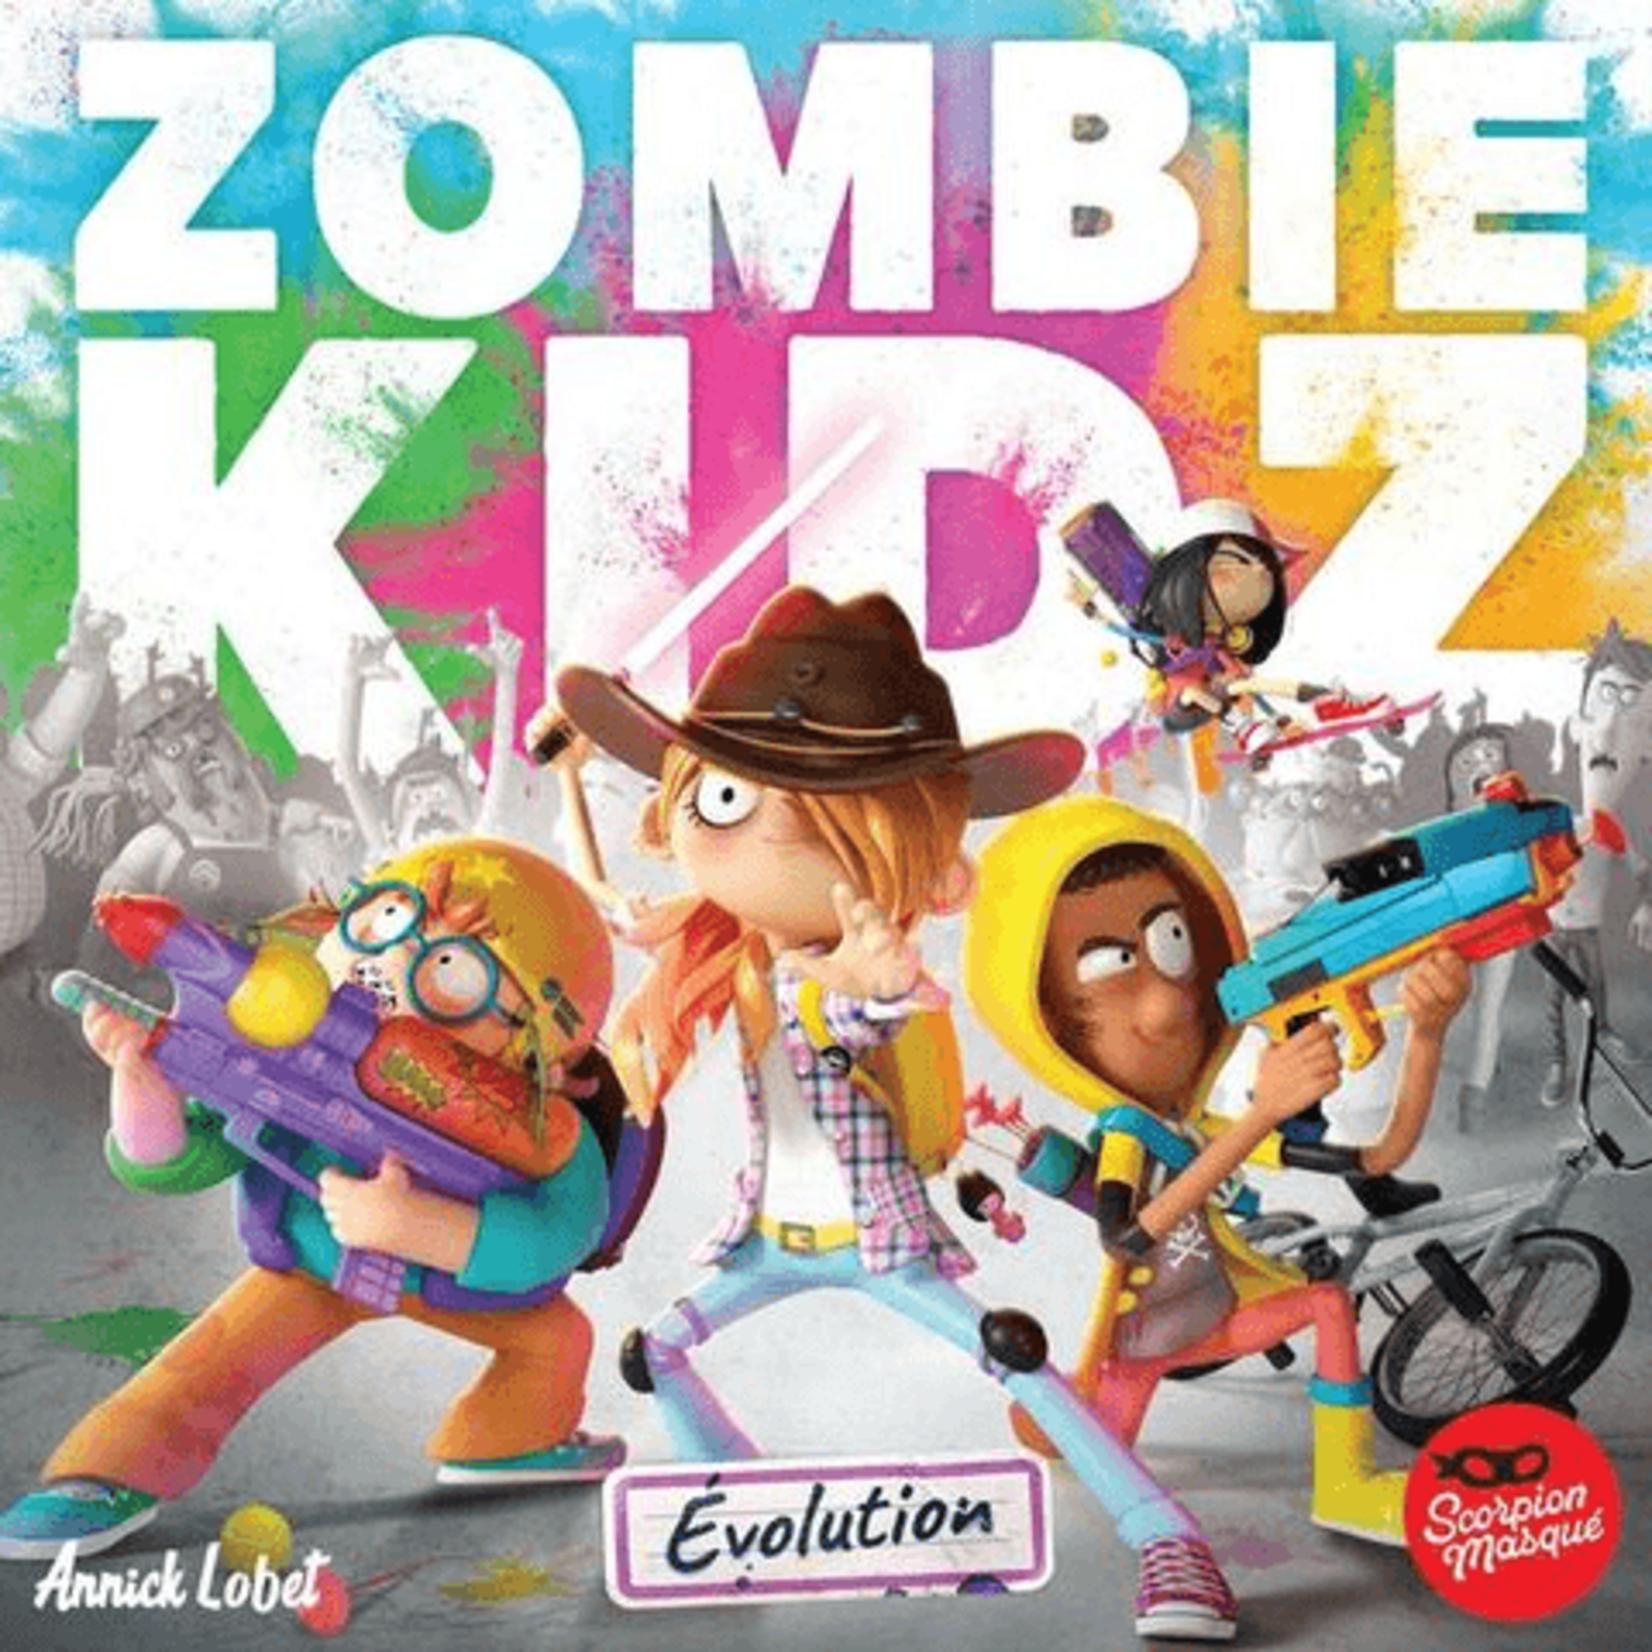 Iello Zombie Kidz Evolution